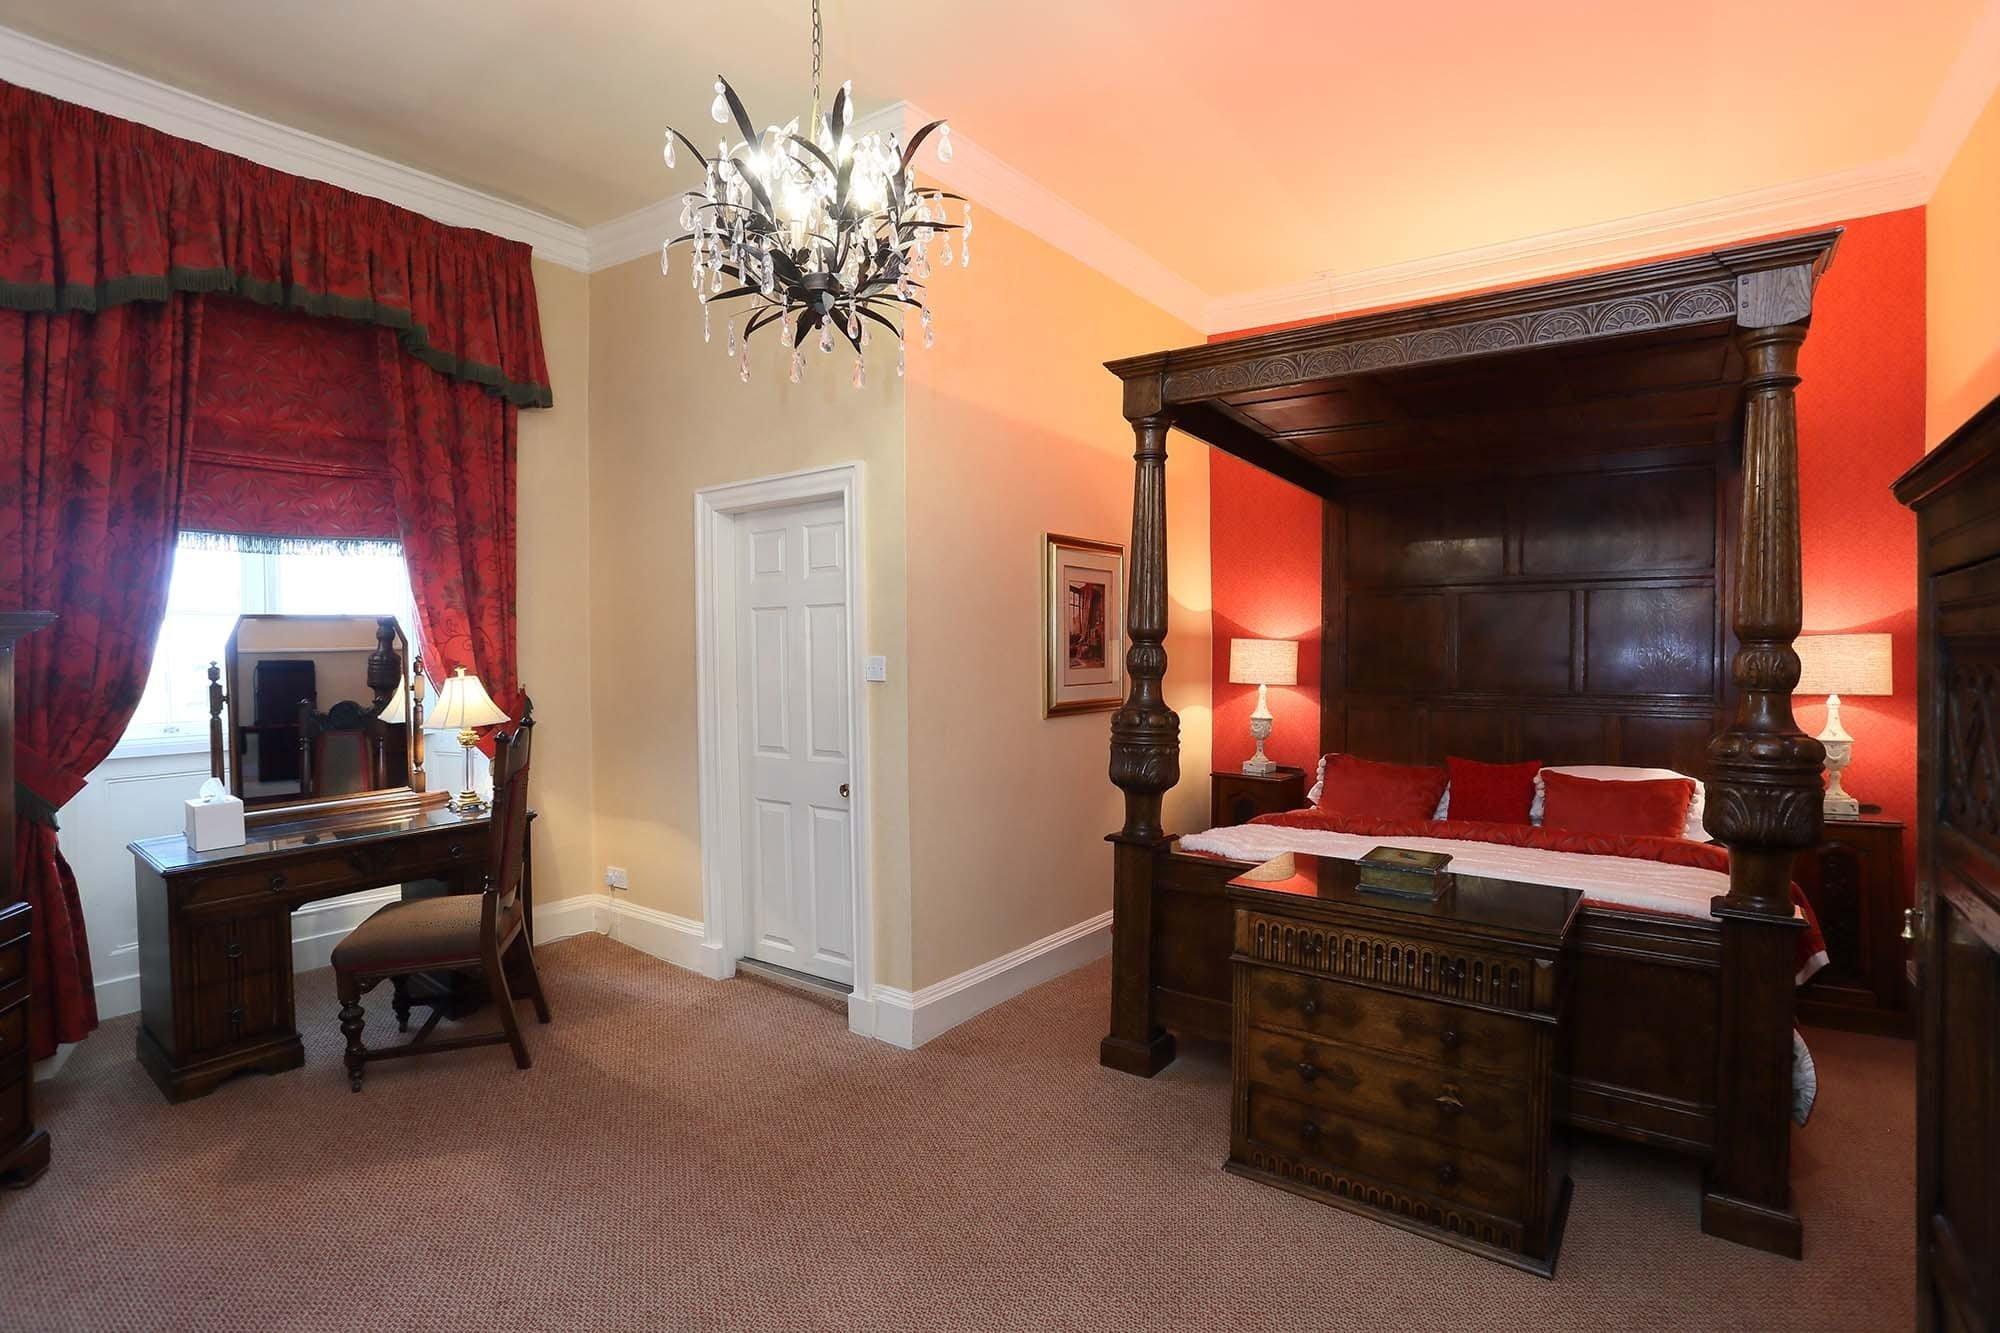 Yockleton Room, Rowton Castle Accommodation